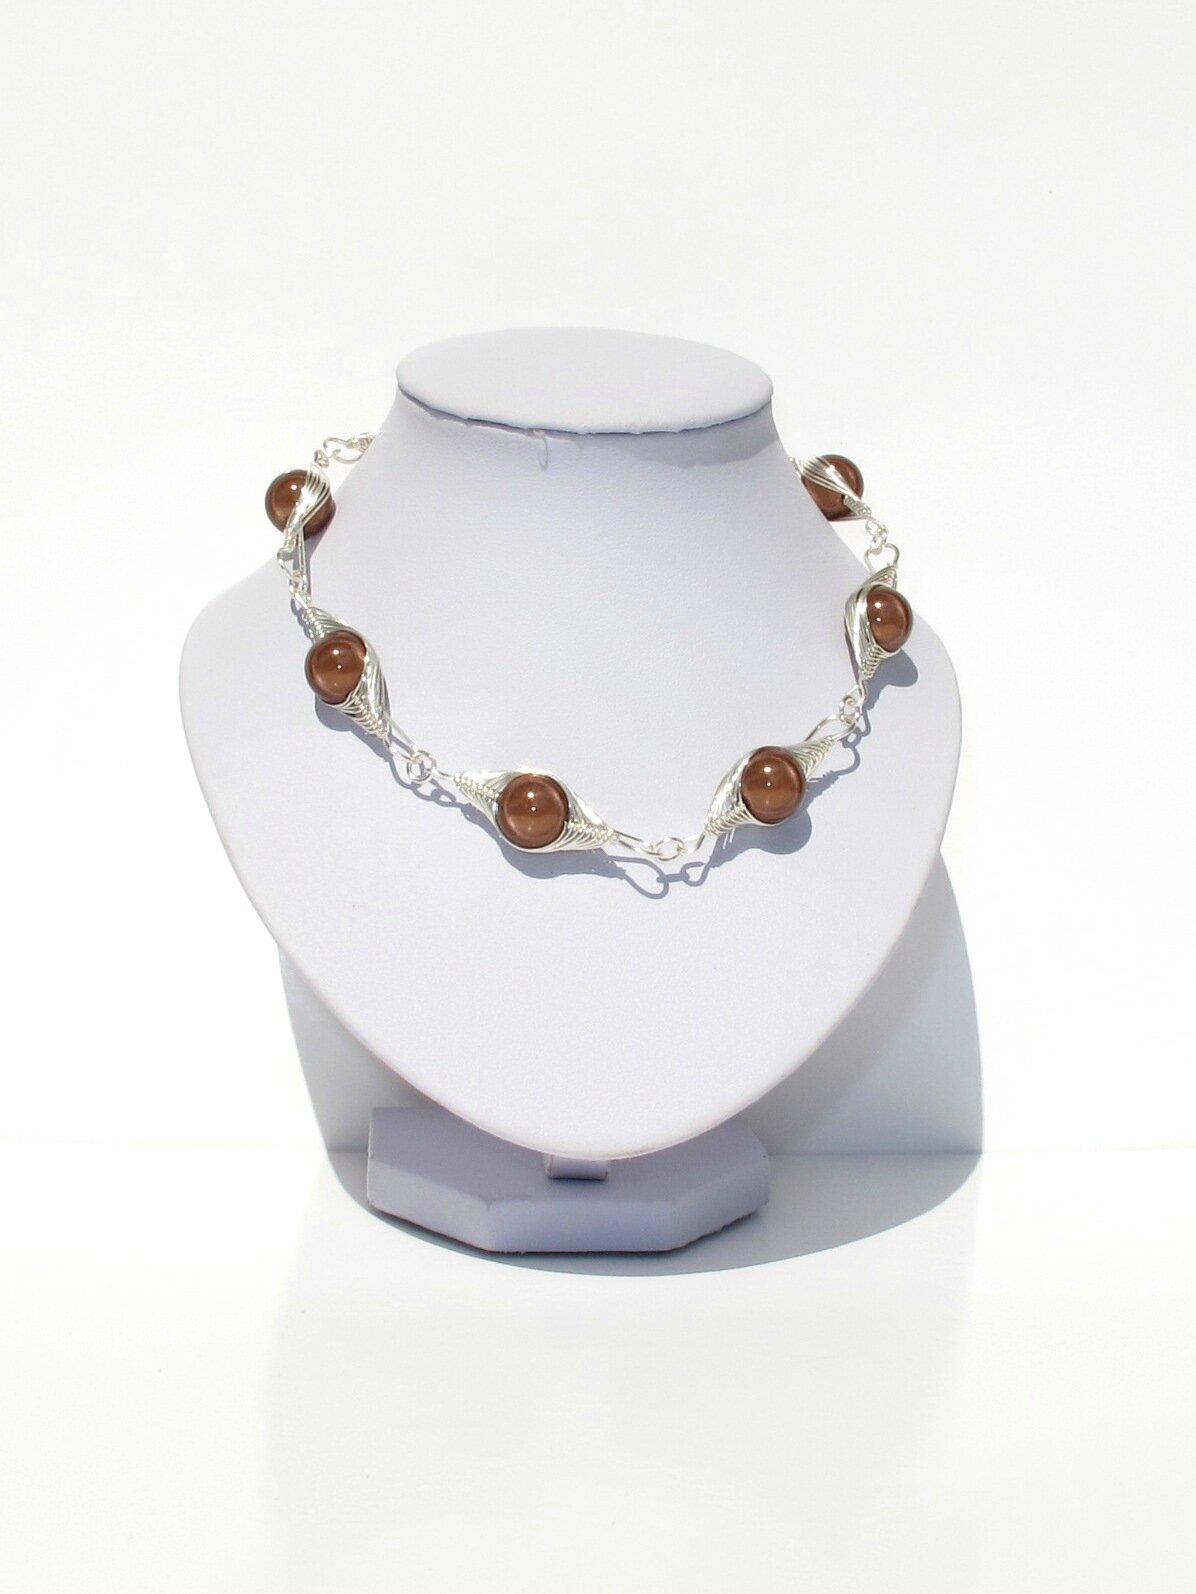 collier wire argent perles marron buste balnc